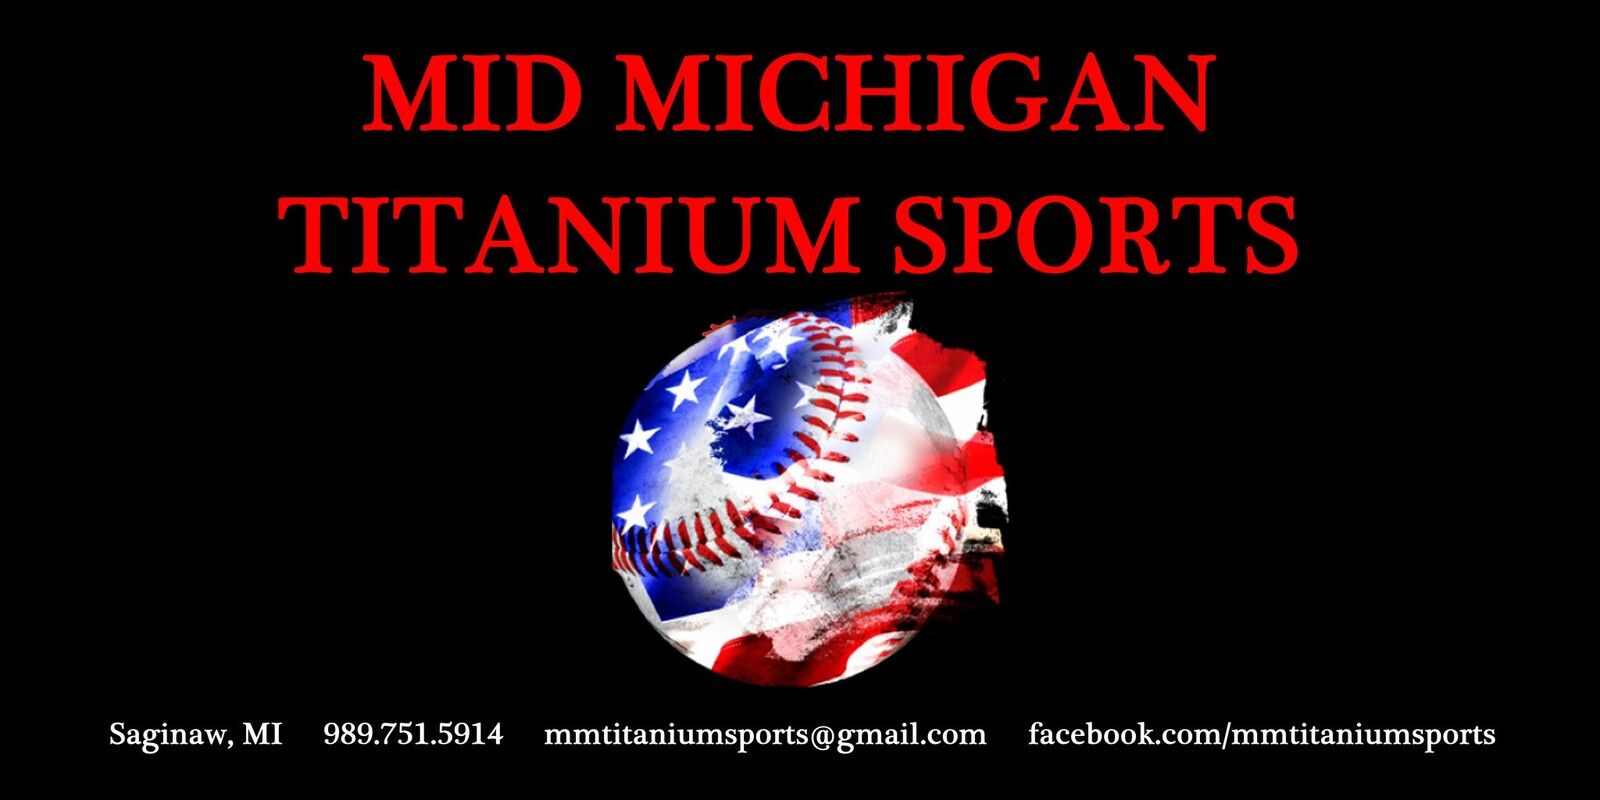 Mid Michigan Titanium Sports